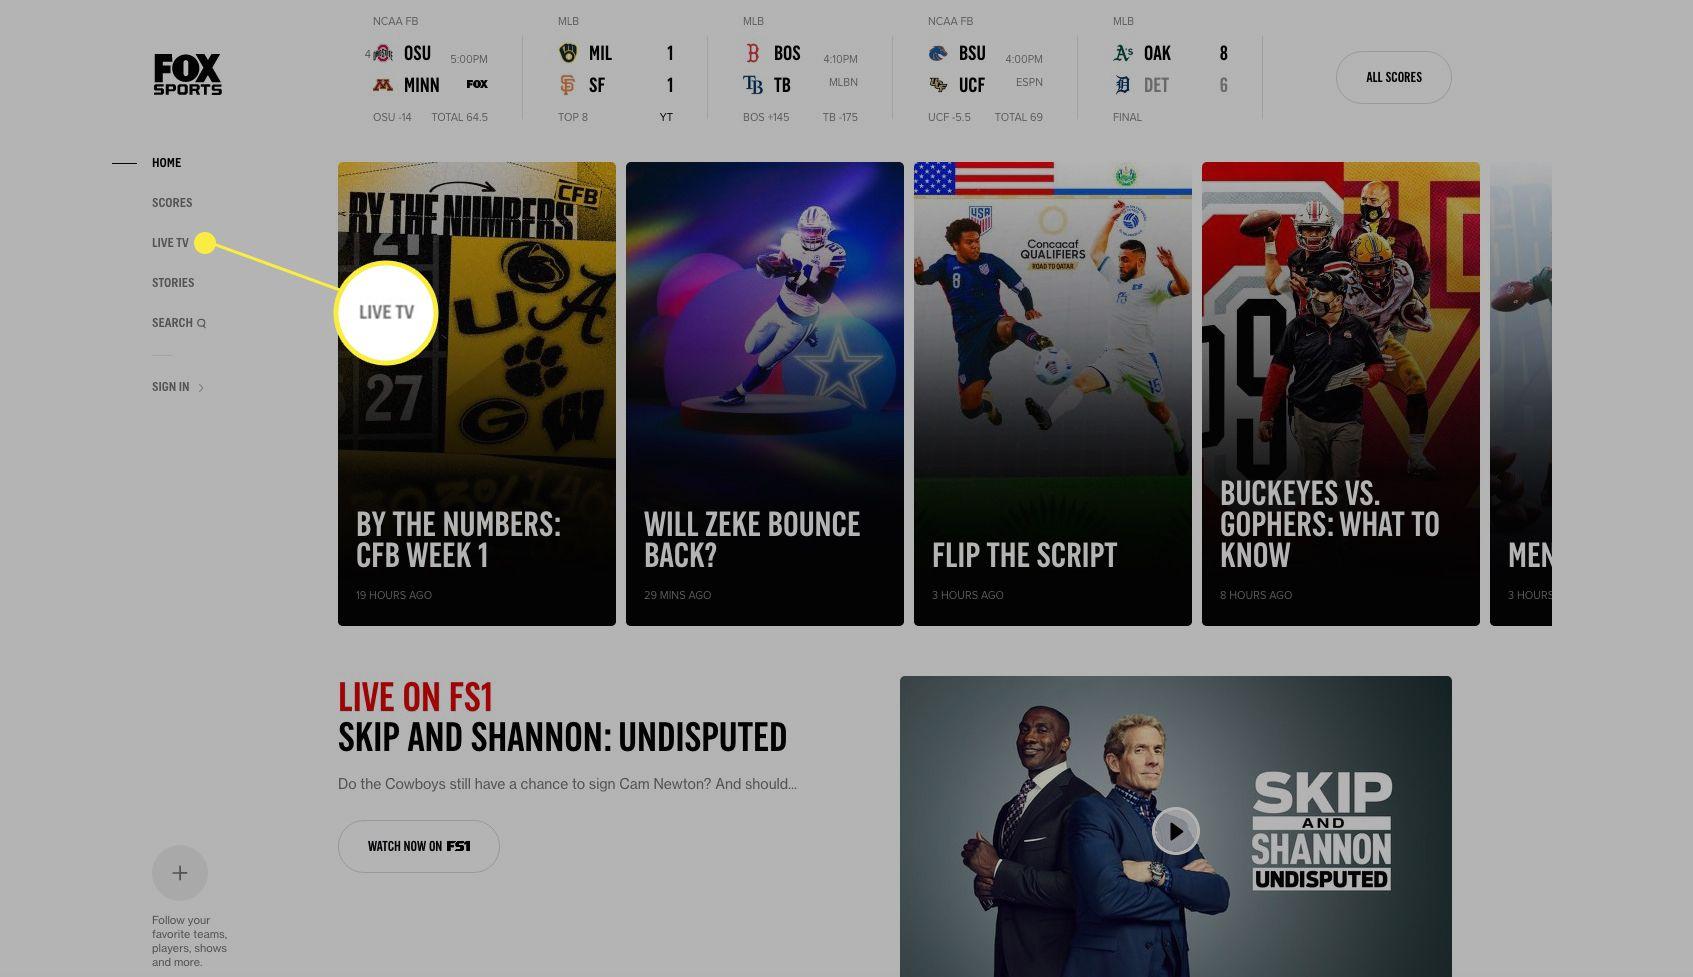 Fox Sports.com website with Live TV highlighted